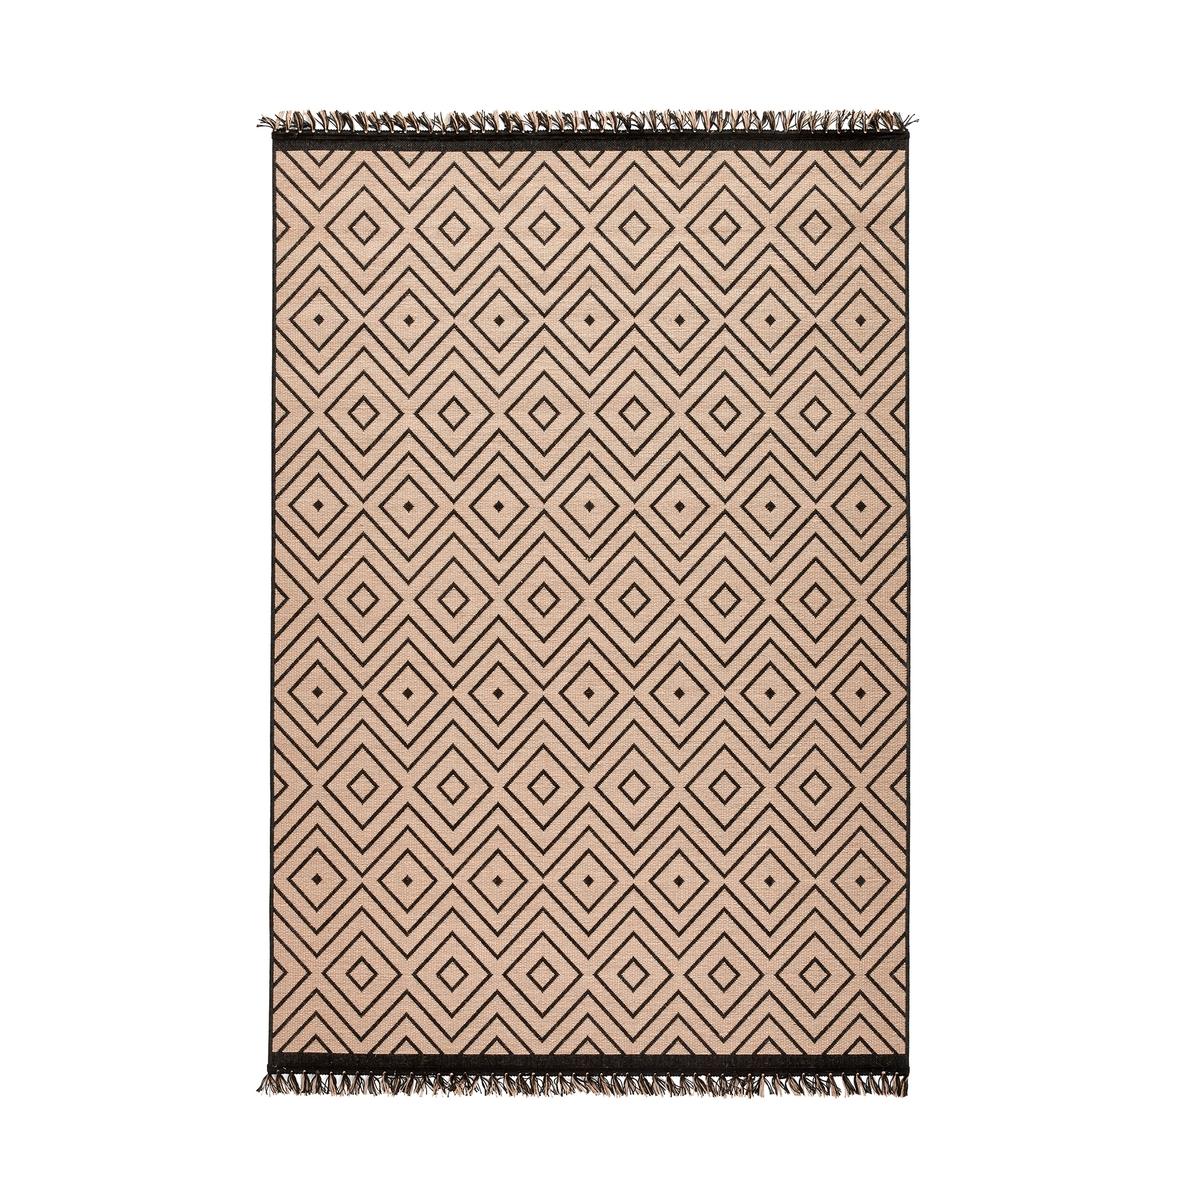 Ковер La Redoute С рисунком из ромбов KYZAC 120 x 170 см бежевый ковер la redoute горизонтального плетения с рисунком цементная плитка iswik 120 x 170 см бежевый